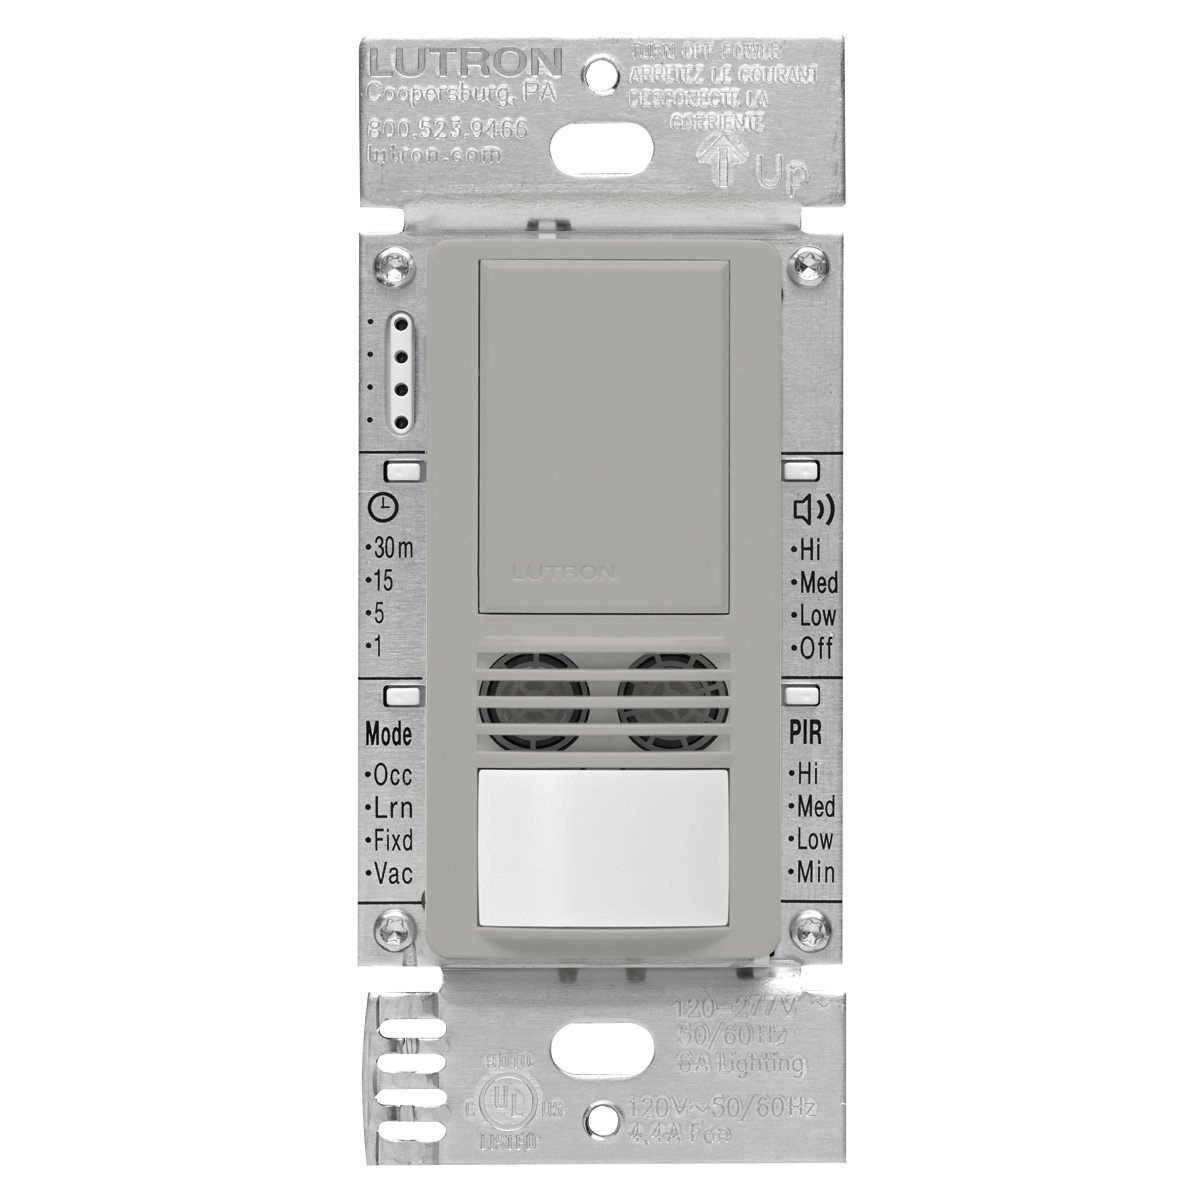 Buy Lutron Maestro Dual Tech Occupancy Sensor Switch, neutral ...